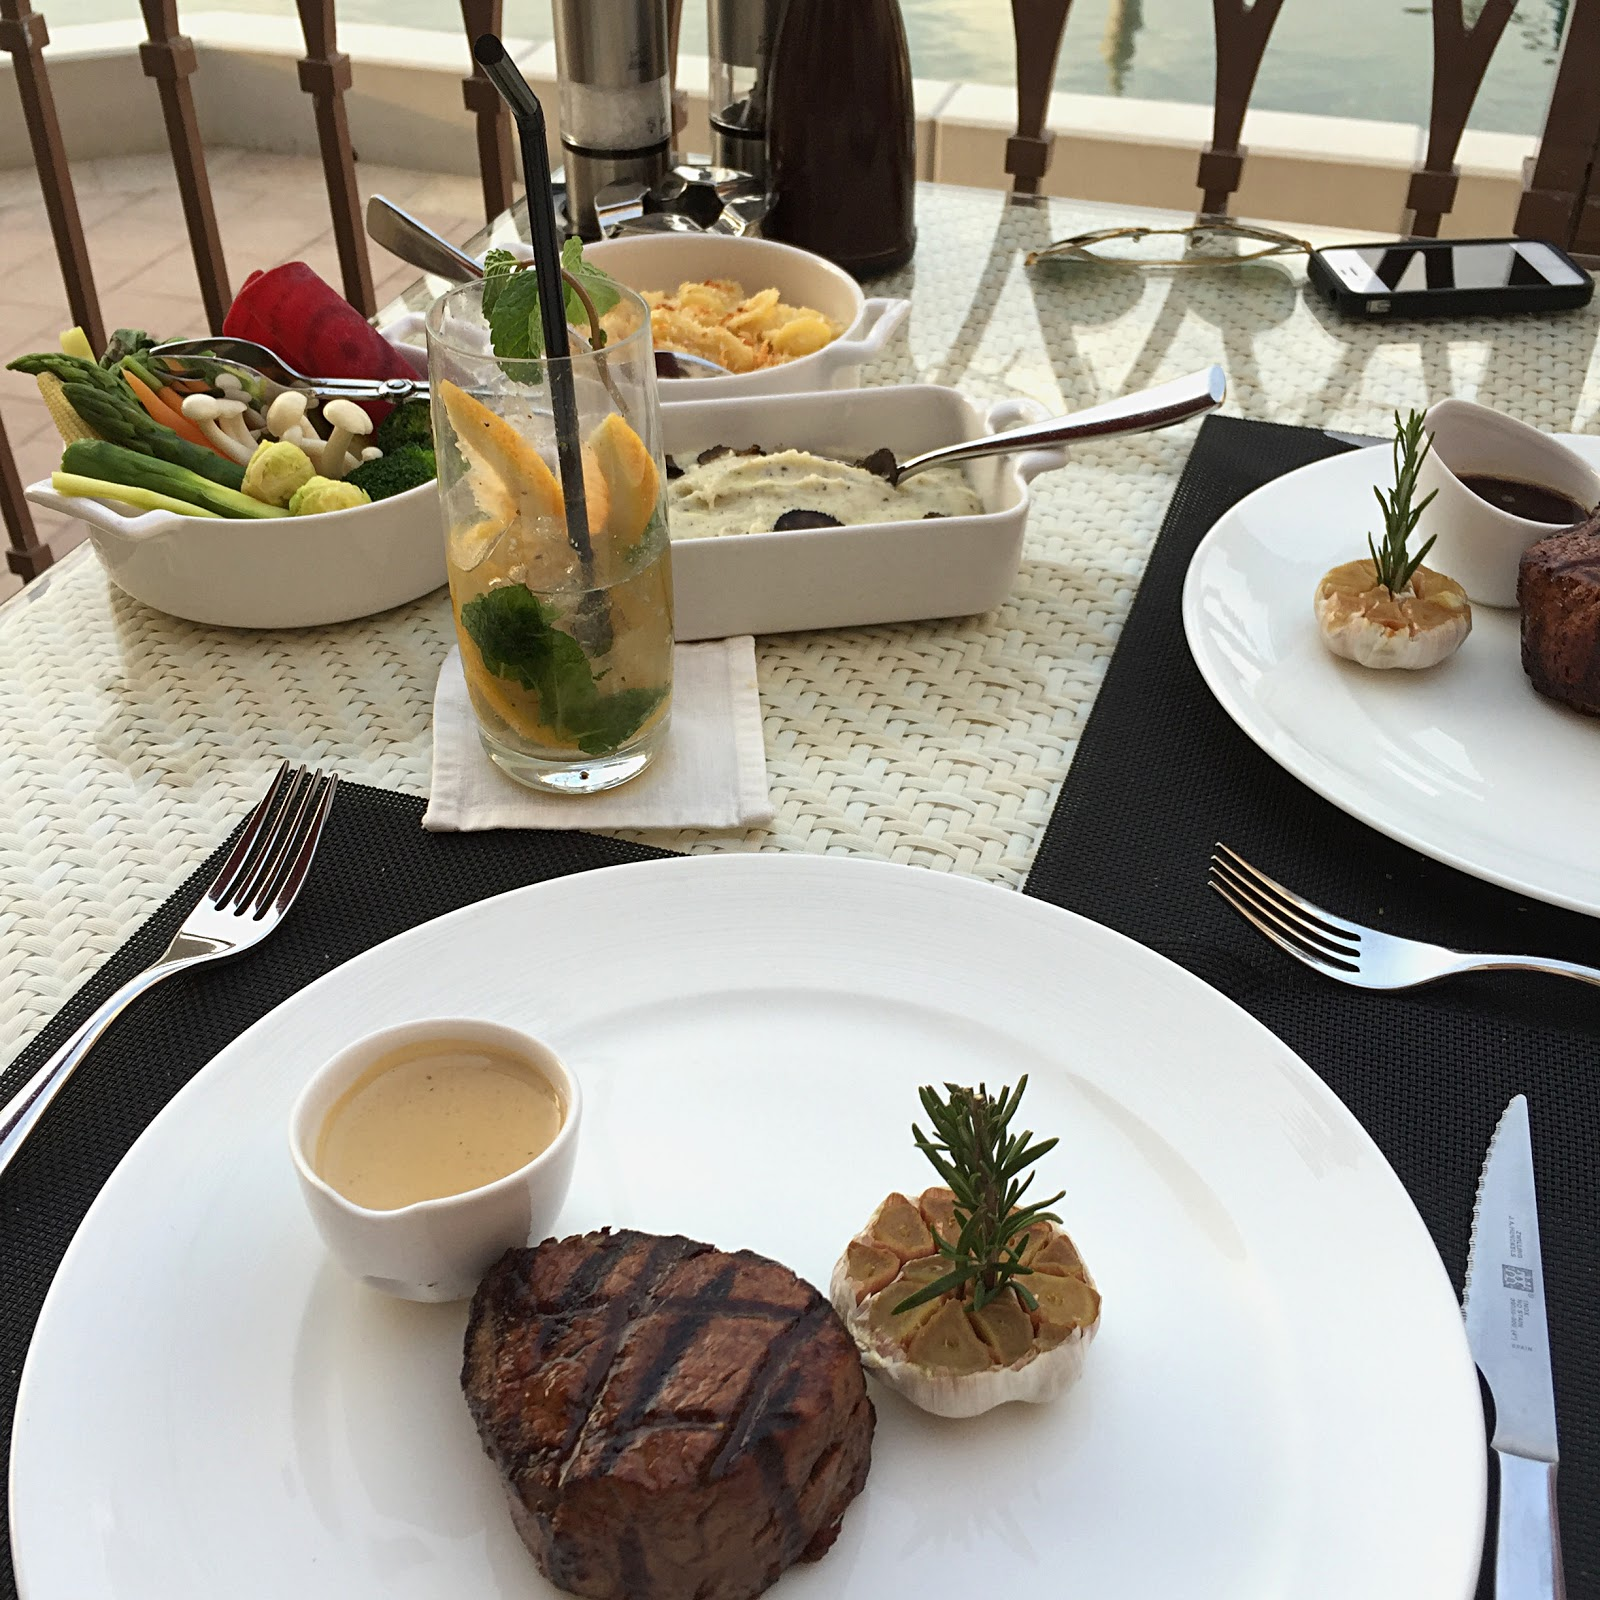 Boa Steakhouse Abu Dhabi